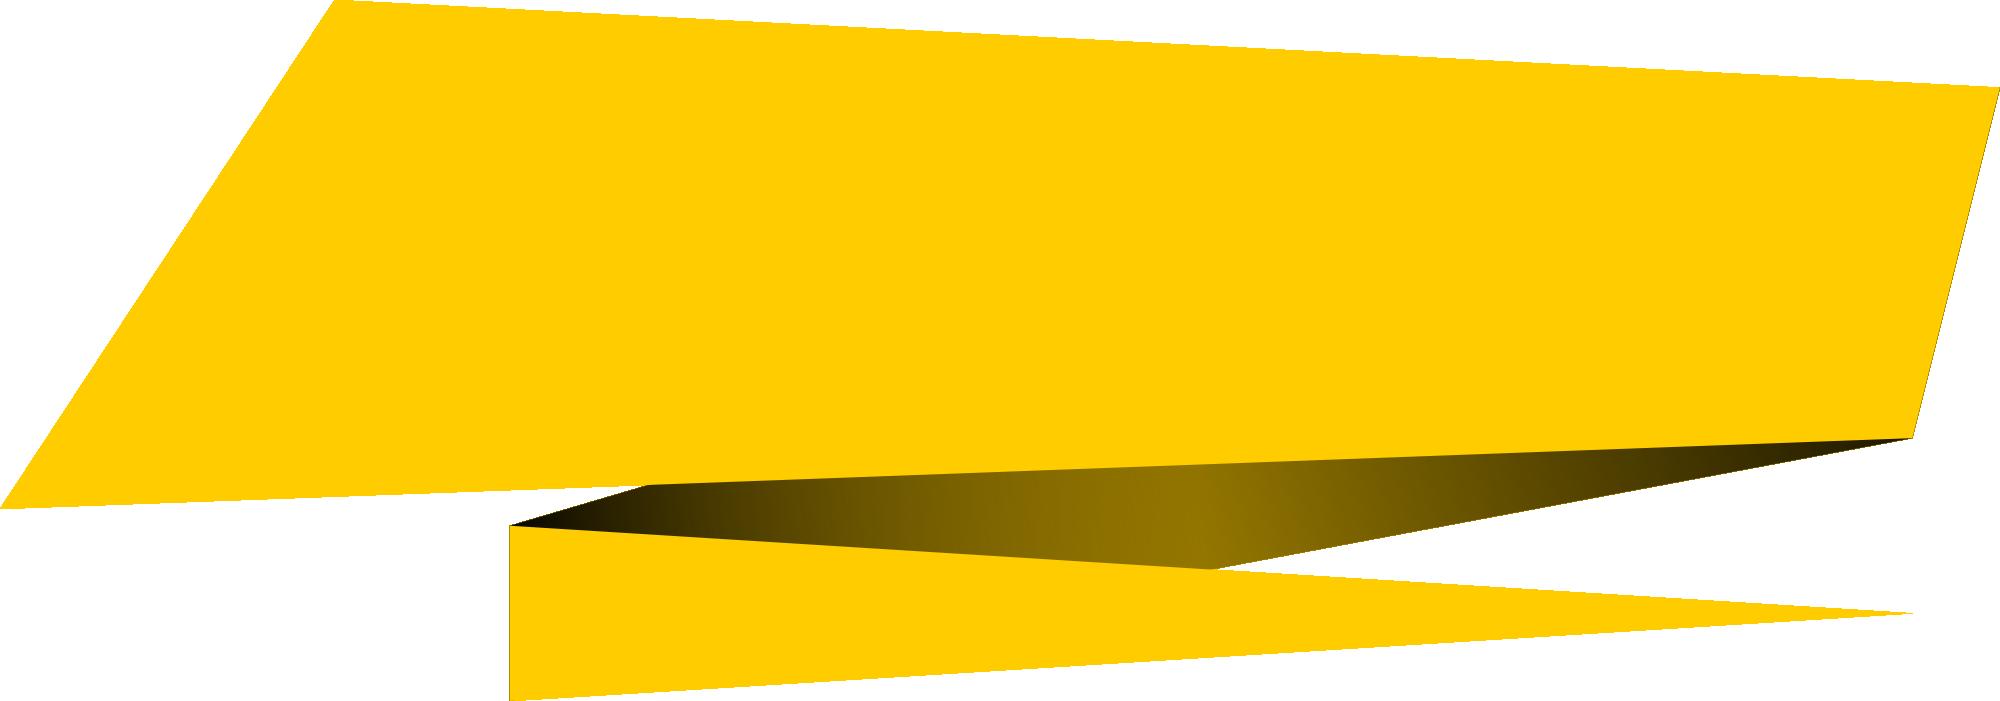 6 Origami Banner Rectangle Vector (PNG Transparent, SVG